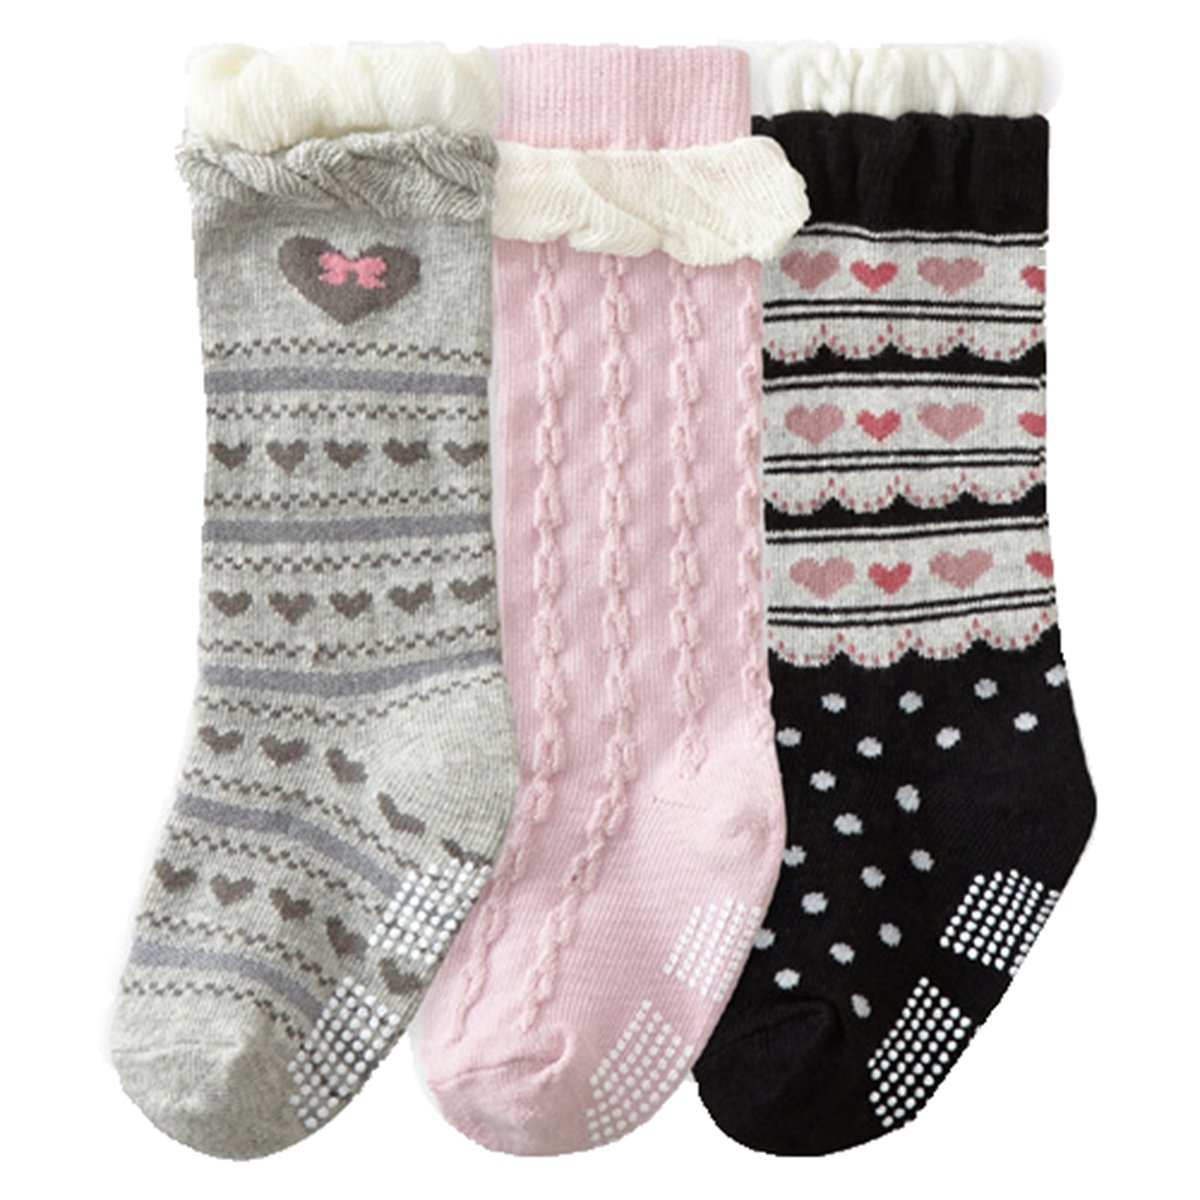 Baby Girls Non Skid Cotton Colorful Heart Toddler Socks Knee High Socks 3-Pairs